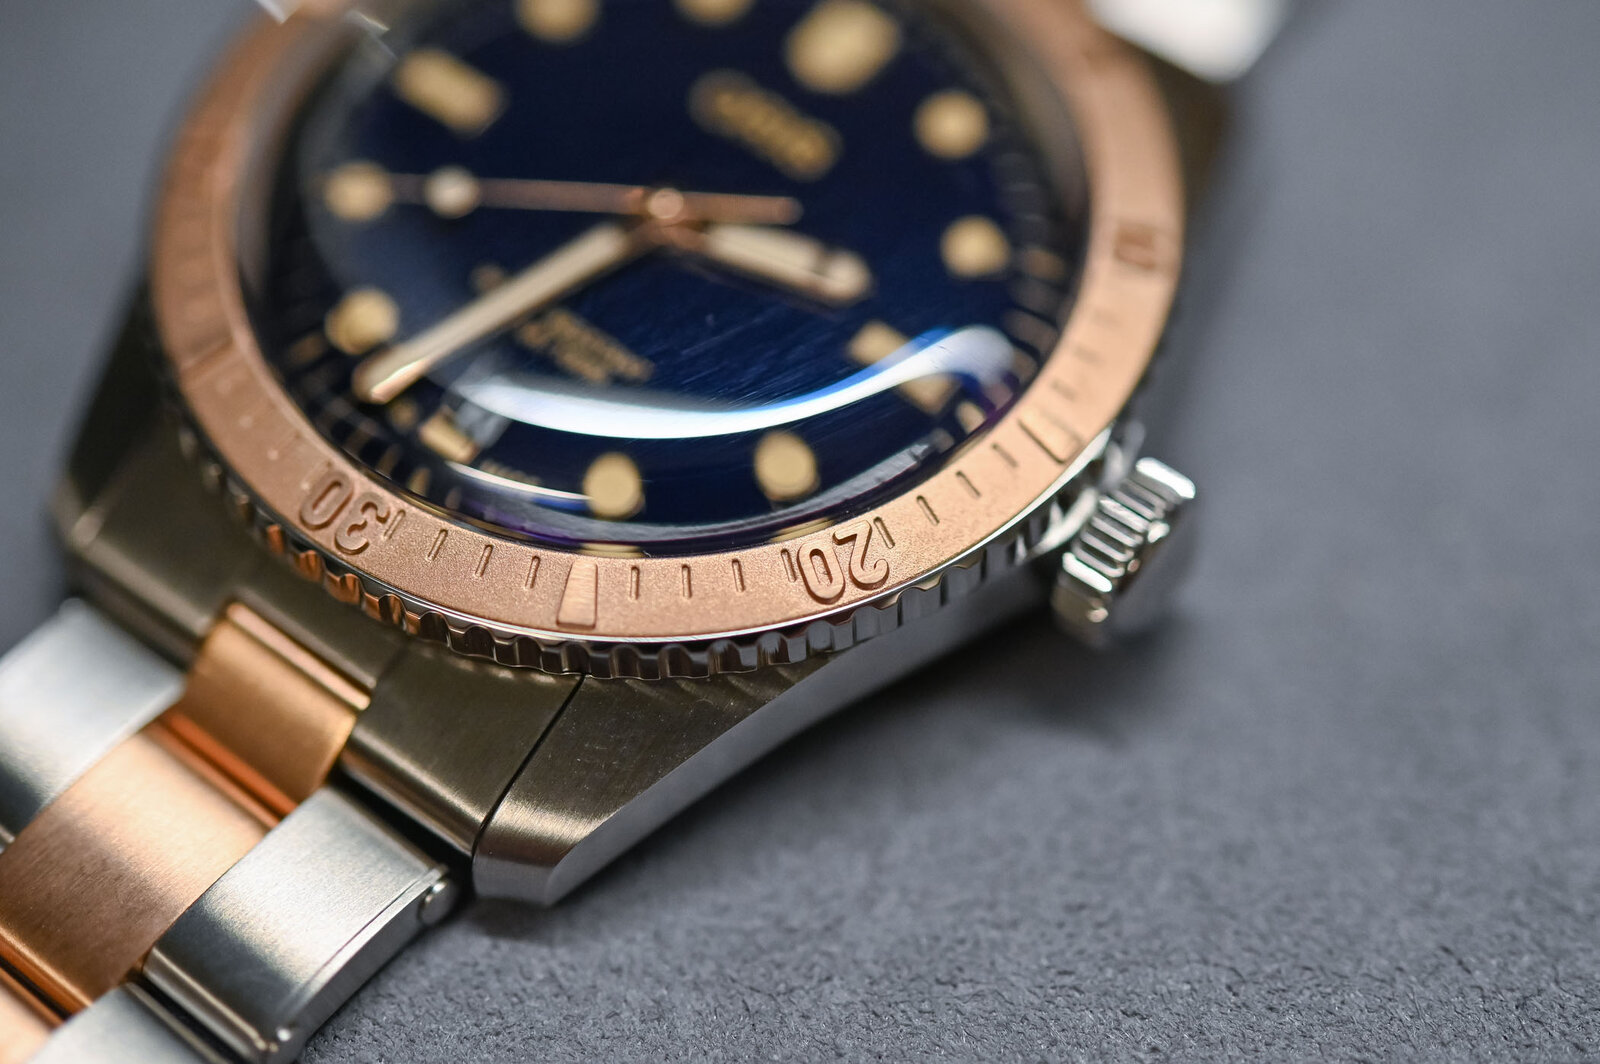 Oris-Divers-Sixty-Five-Bi-Colour-Bico-Steel-and-Bronze-Bracelet-3.